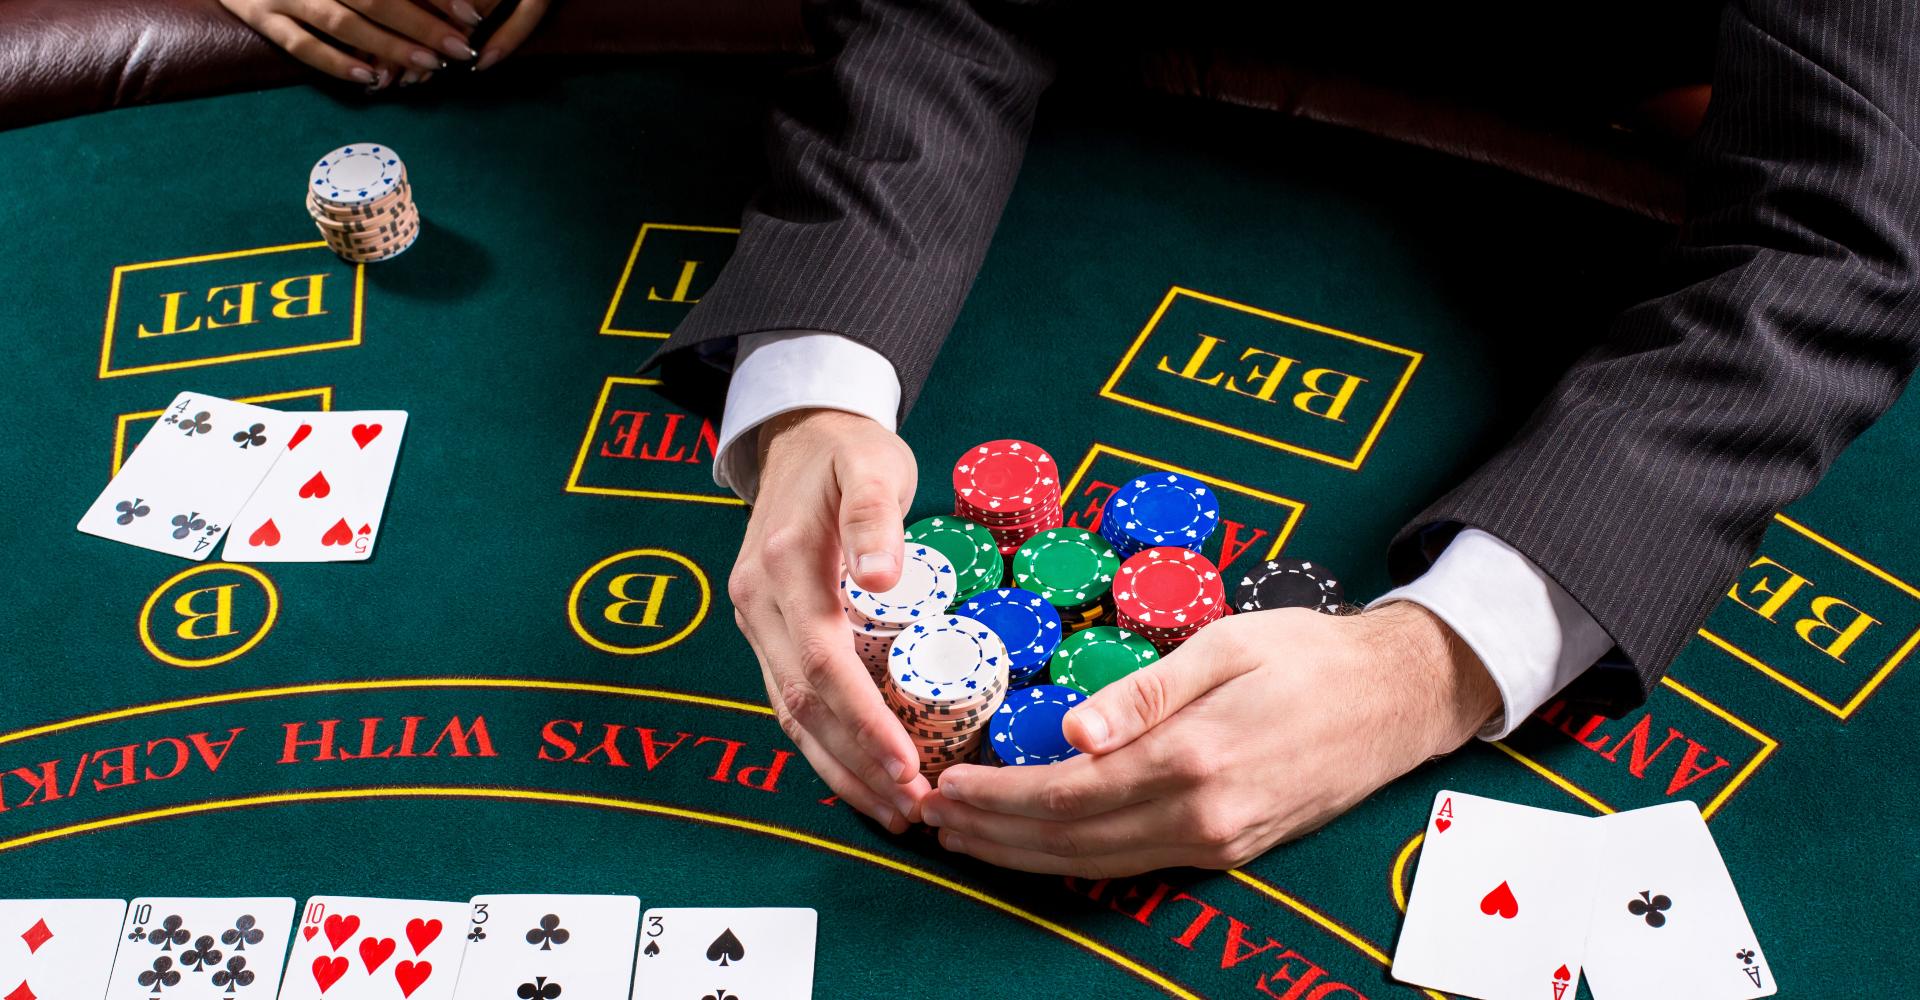 Strategi Untuk Dipahami Ketika Bermain Poker Online